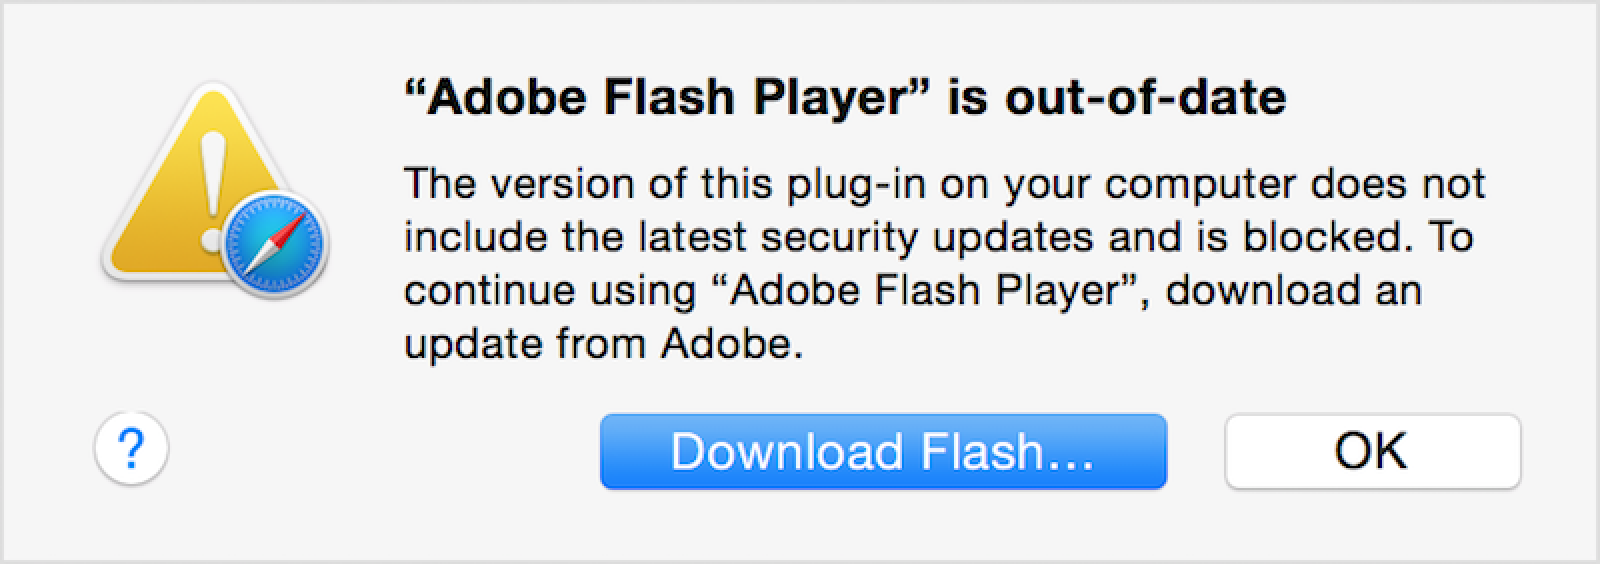 Download New Flash Player Maccoursetree